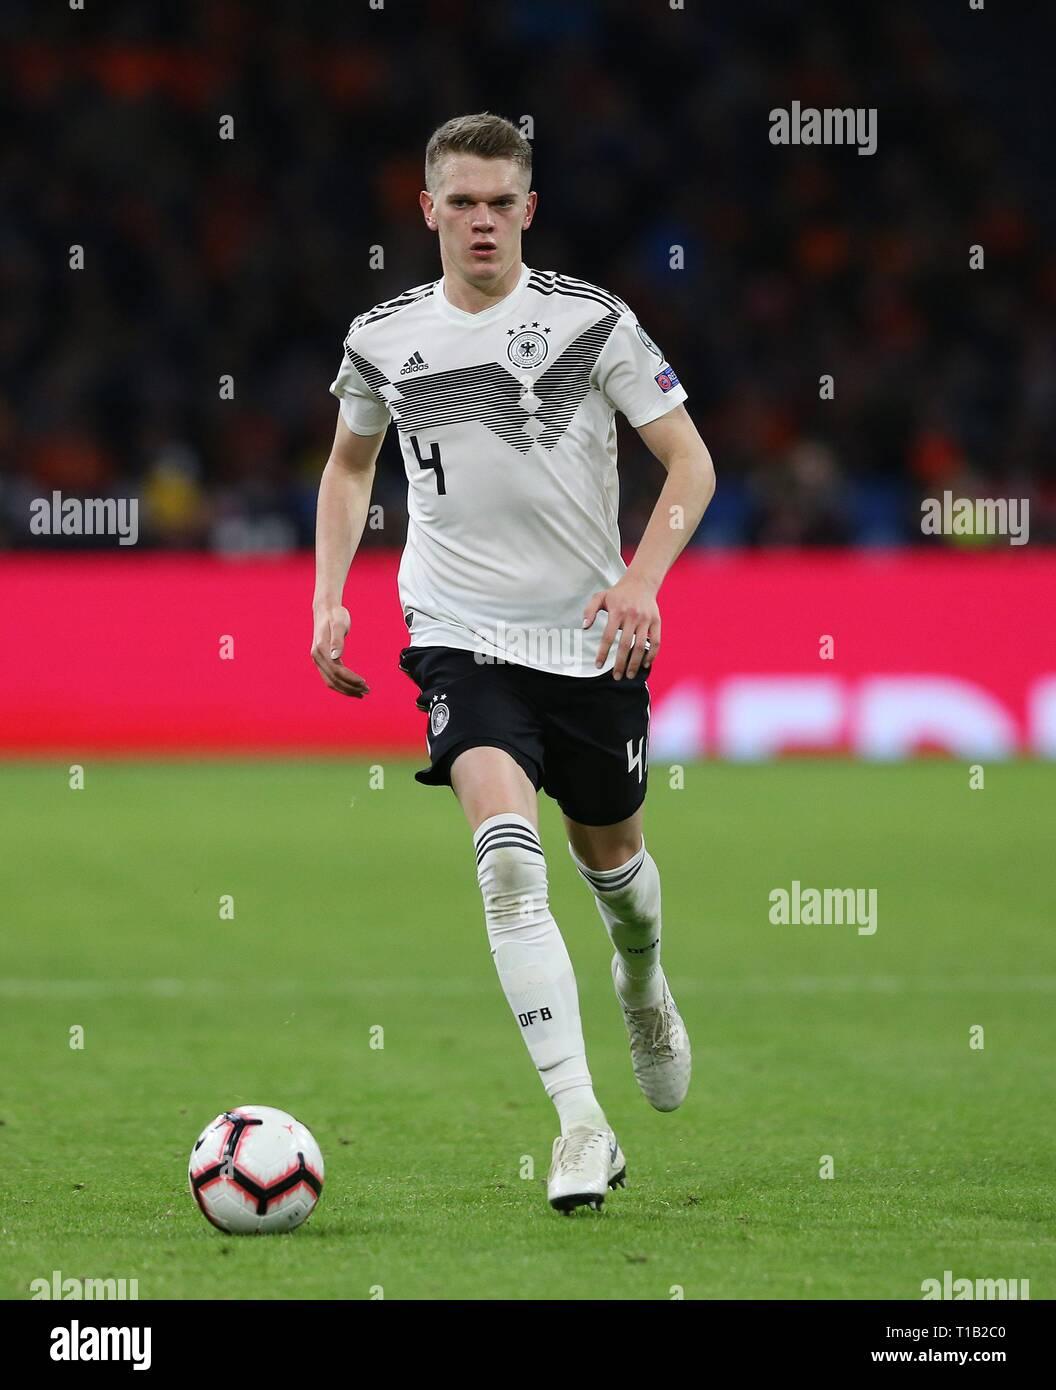 2ecdea65f 25th Mar, 2019. firo: 24.03.2019, Football, Football, National Team  Germany, UEFA, European Championship Qualifiers 2010, European Championship  ...